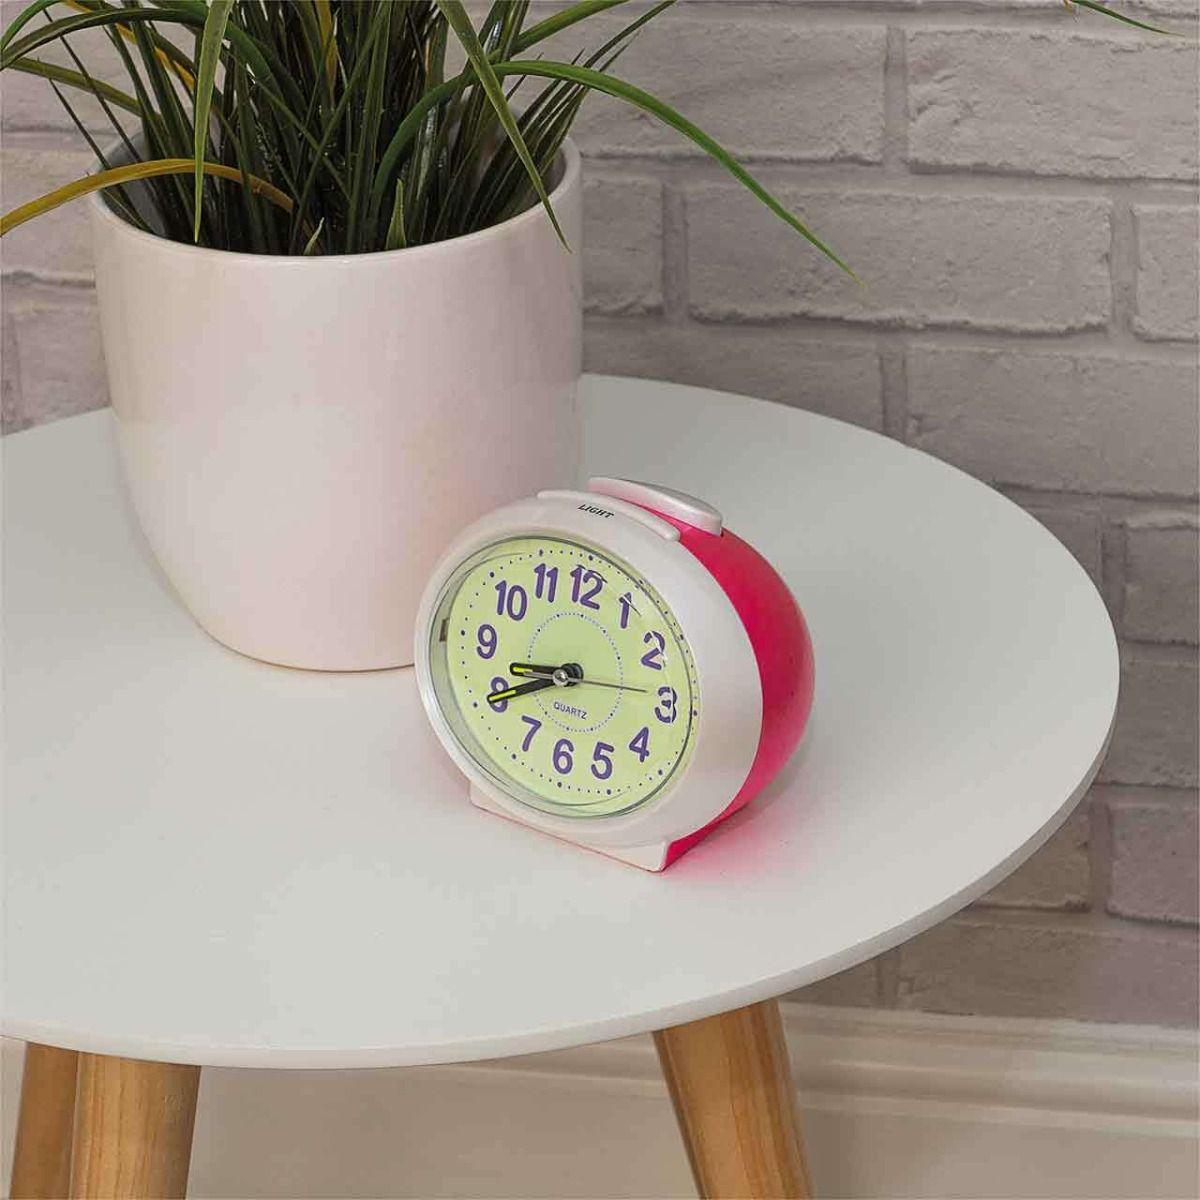 Analog talking clock, contrasting face